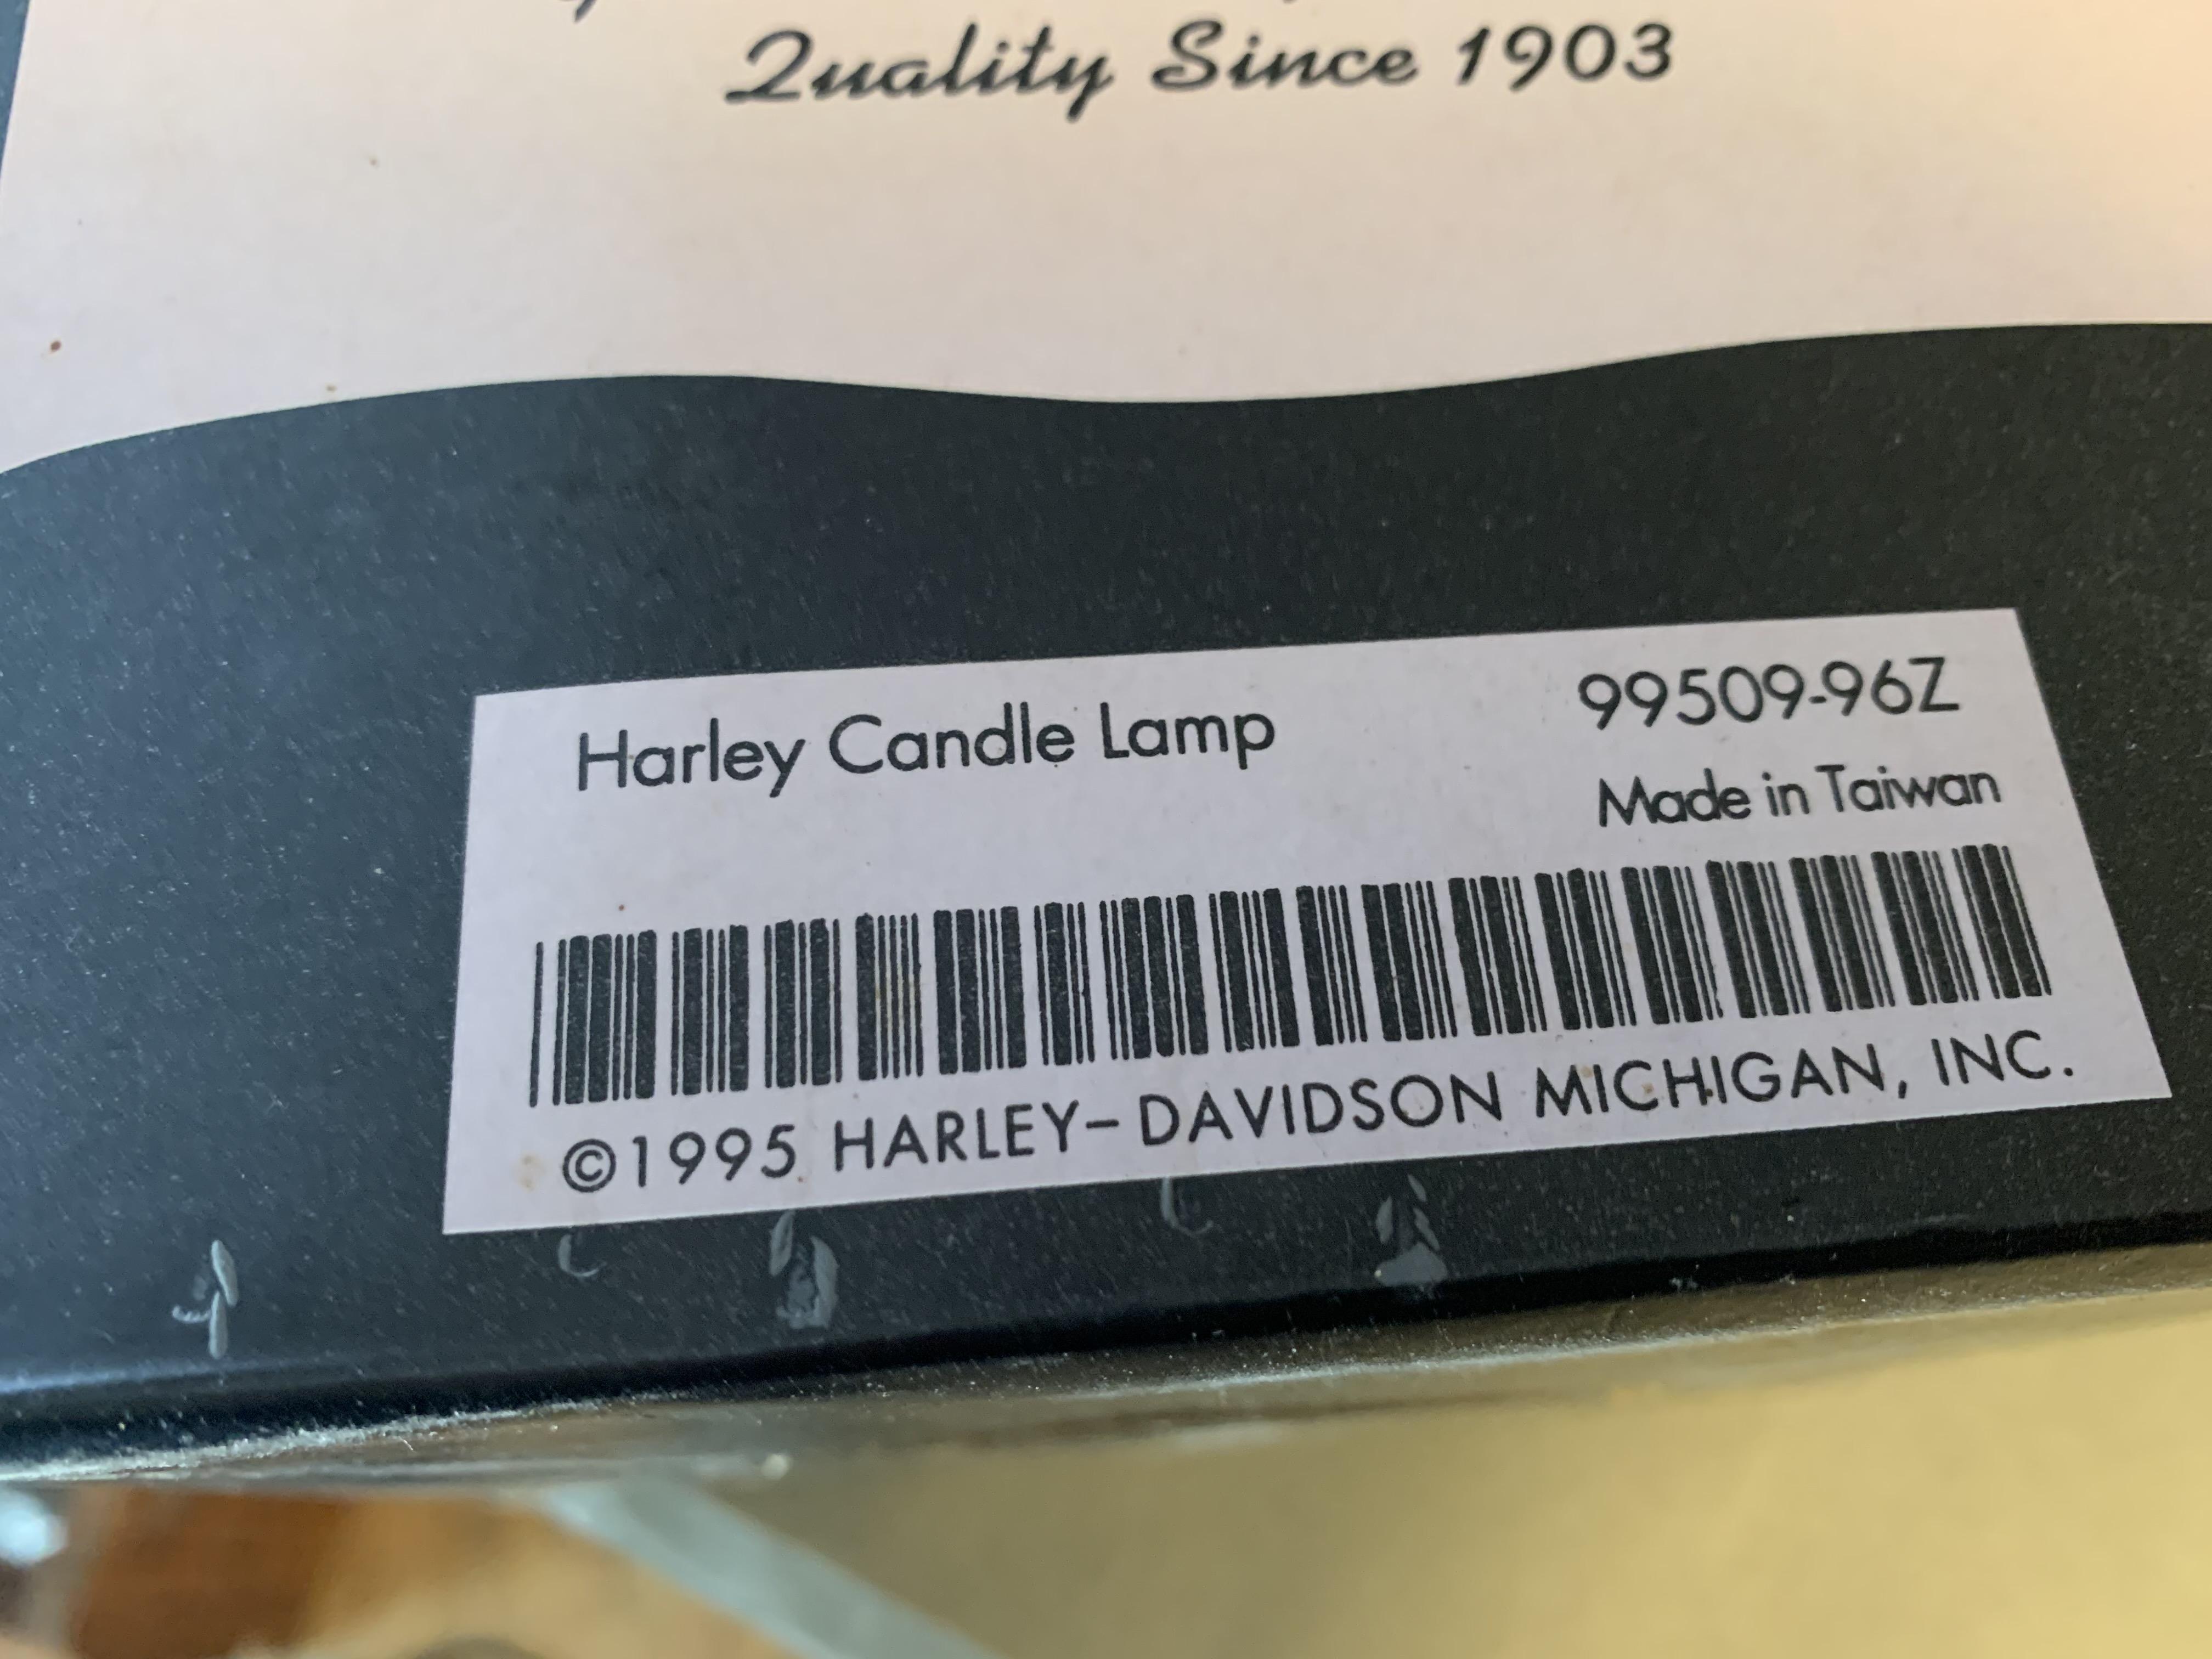 Harley Davidson Candle Lamp